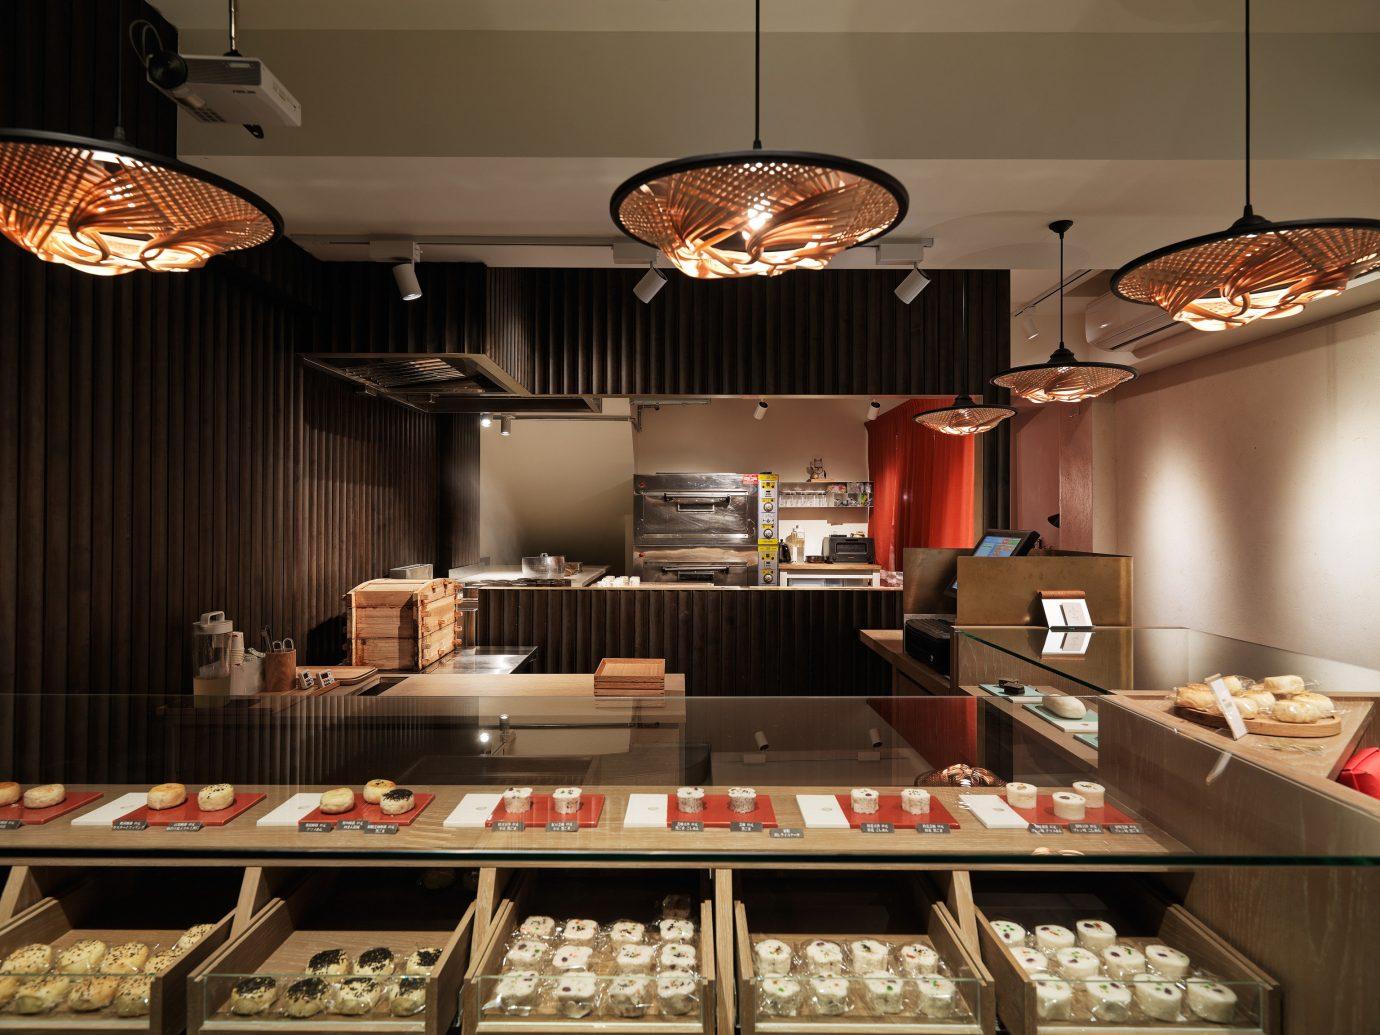 Trip Ideas indoor room food bakery interior design cuisine meal Kitchen countertop Design restaurant counter buffet cabinetry several